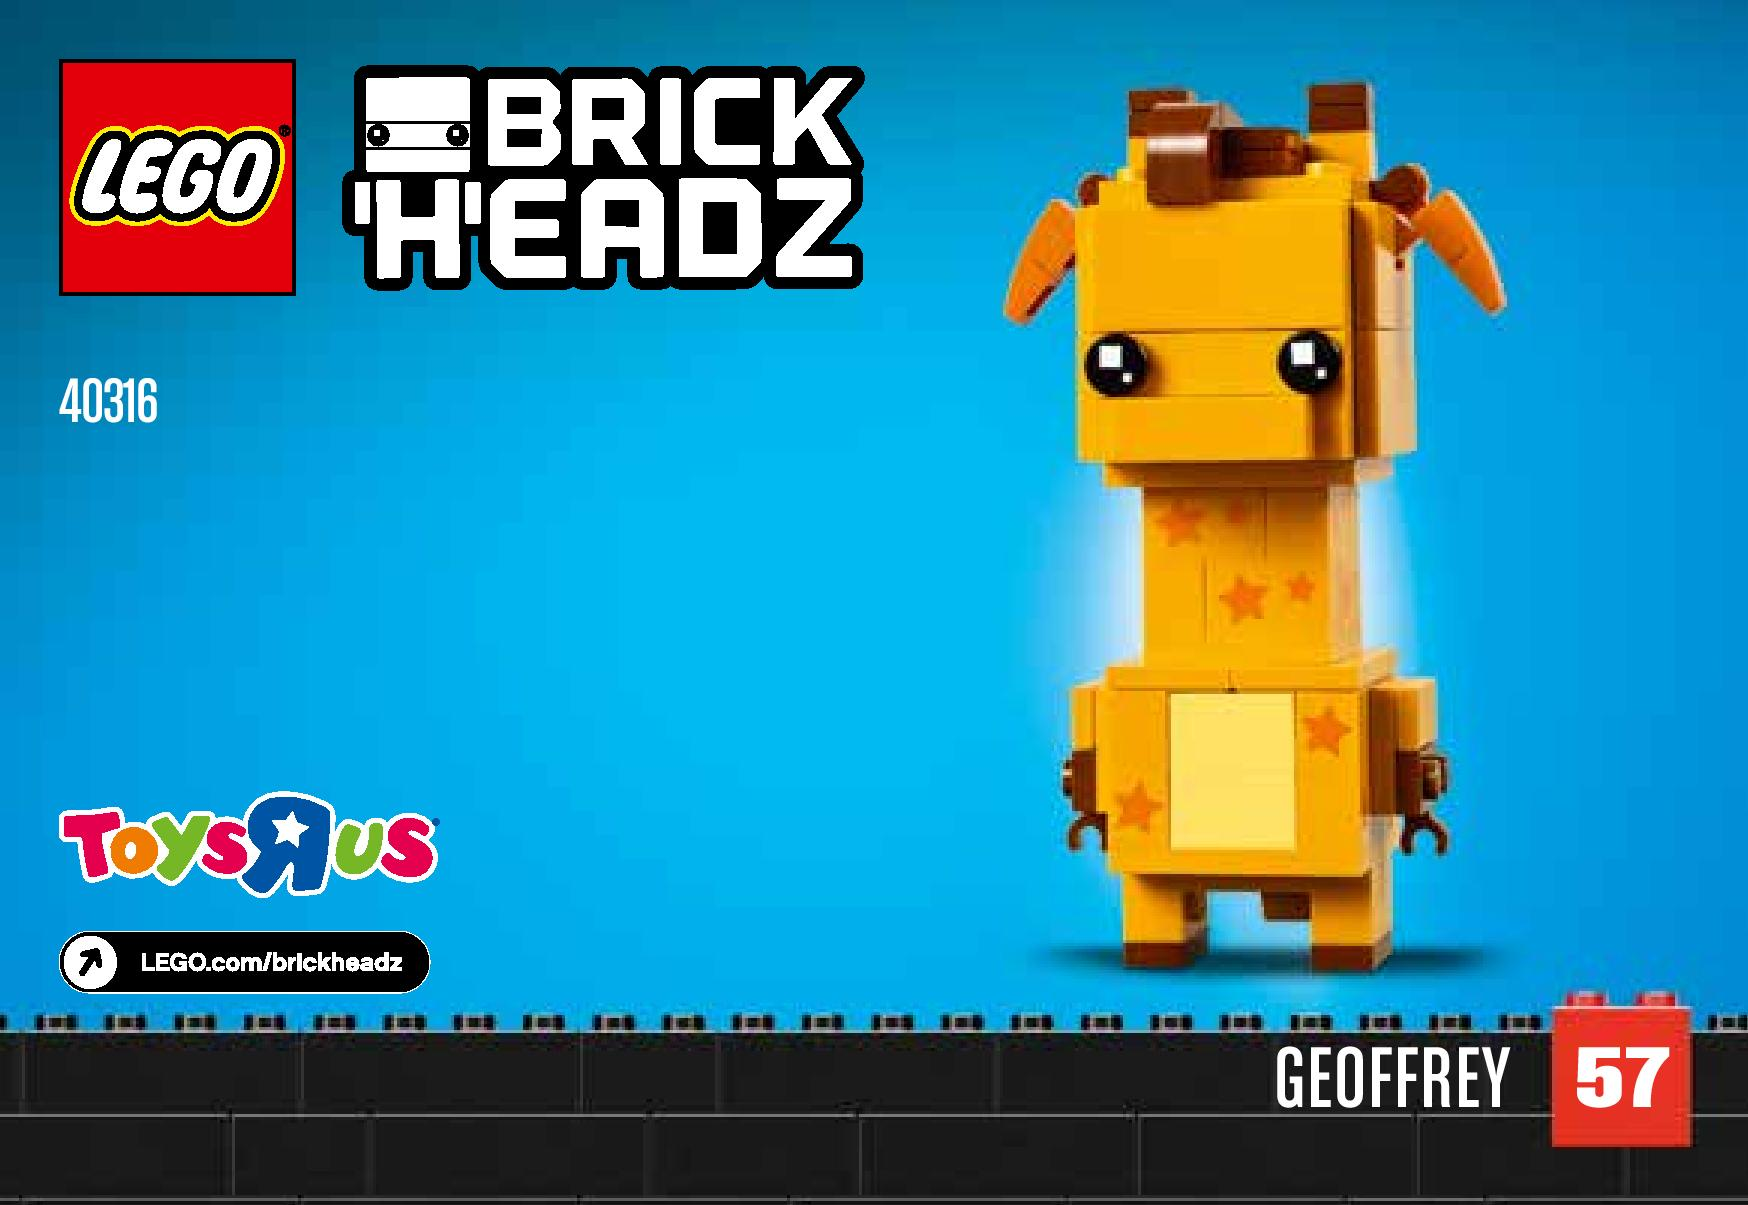 40316 Geoffrey